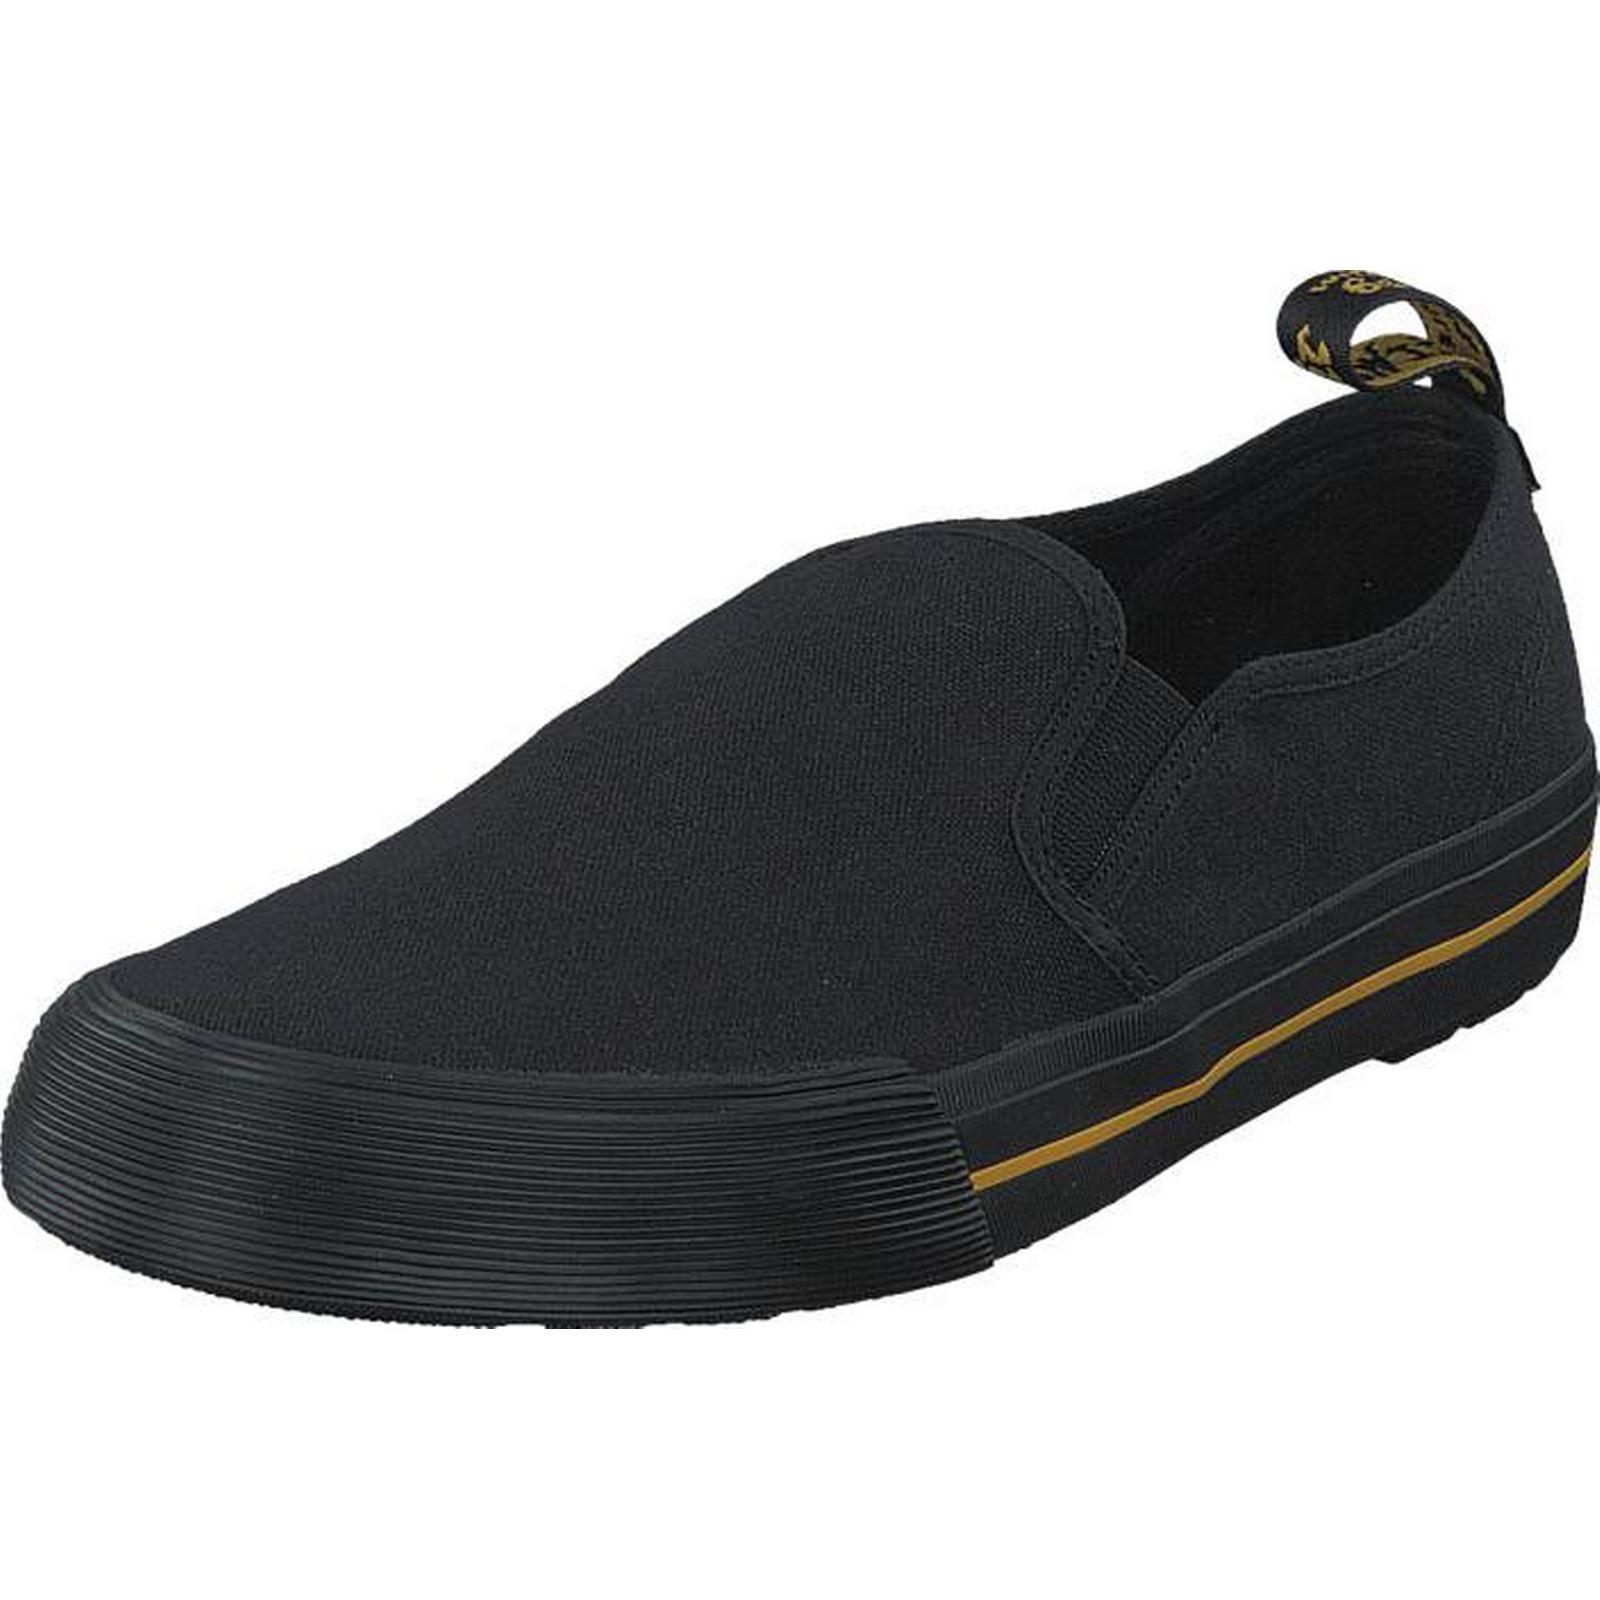 Dr Martens Toomey Shoes, Black, Shoes, Toomey Flats, Espadrilles, Black, Male, 43 af80aa